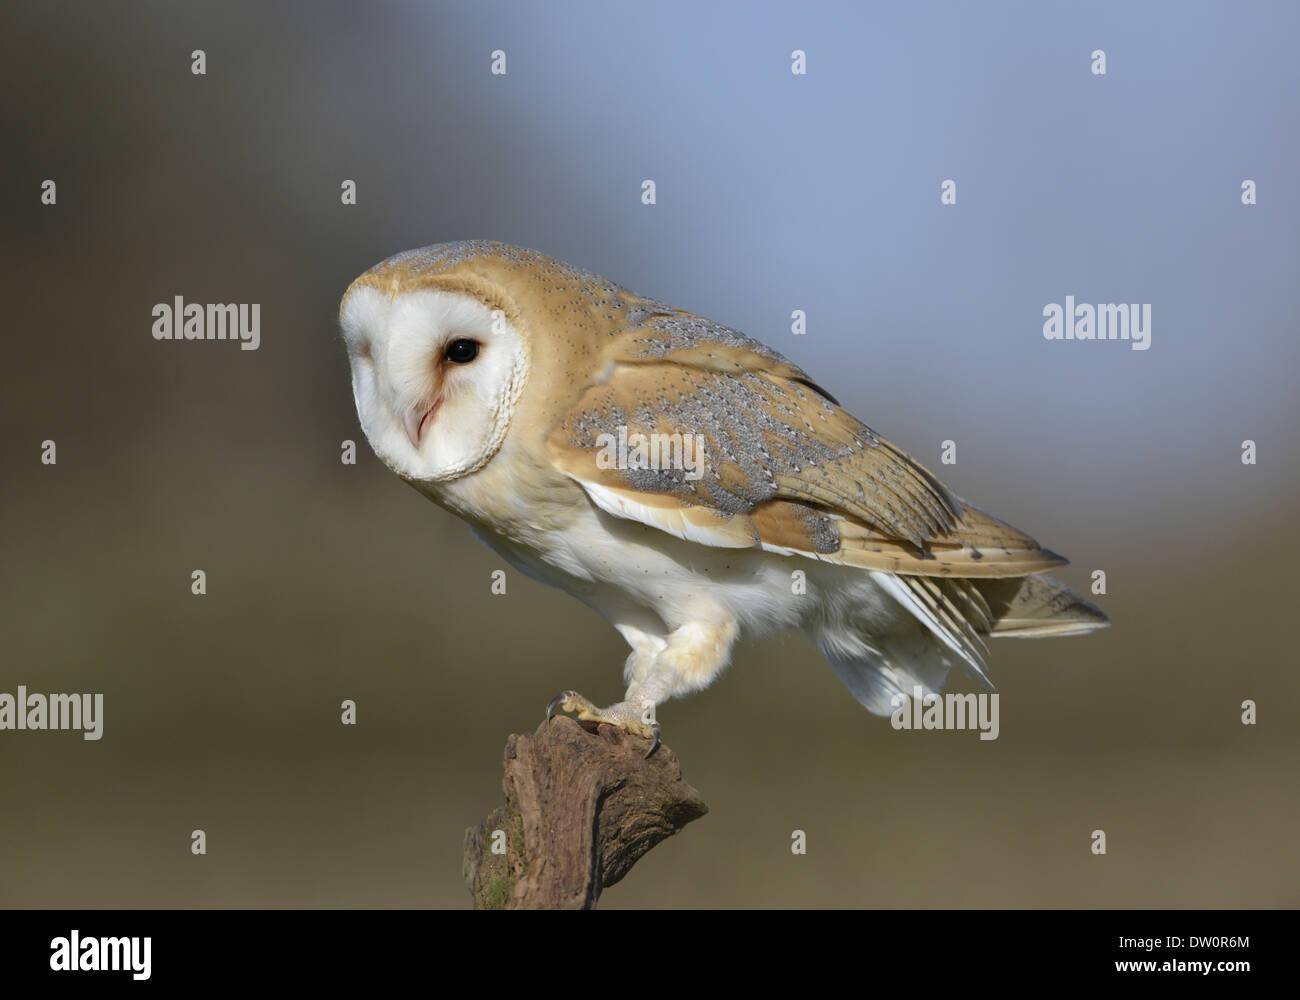 Lechuza Tyto alba Imagen De Stock